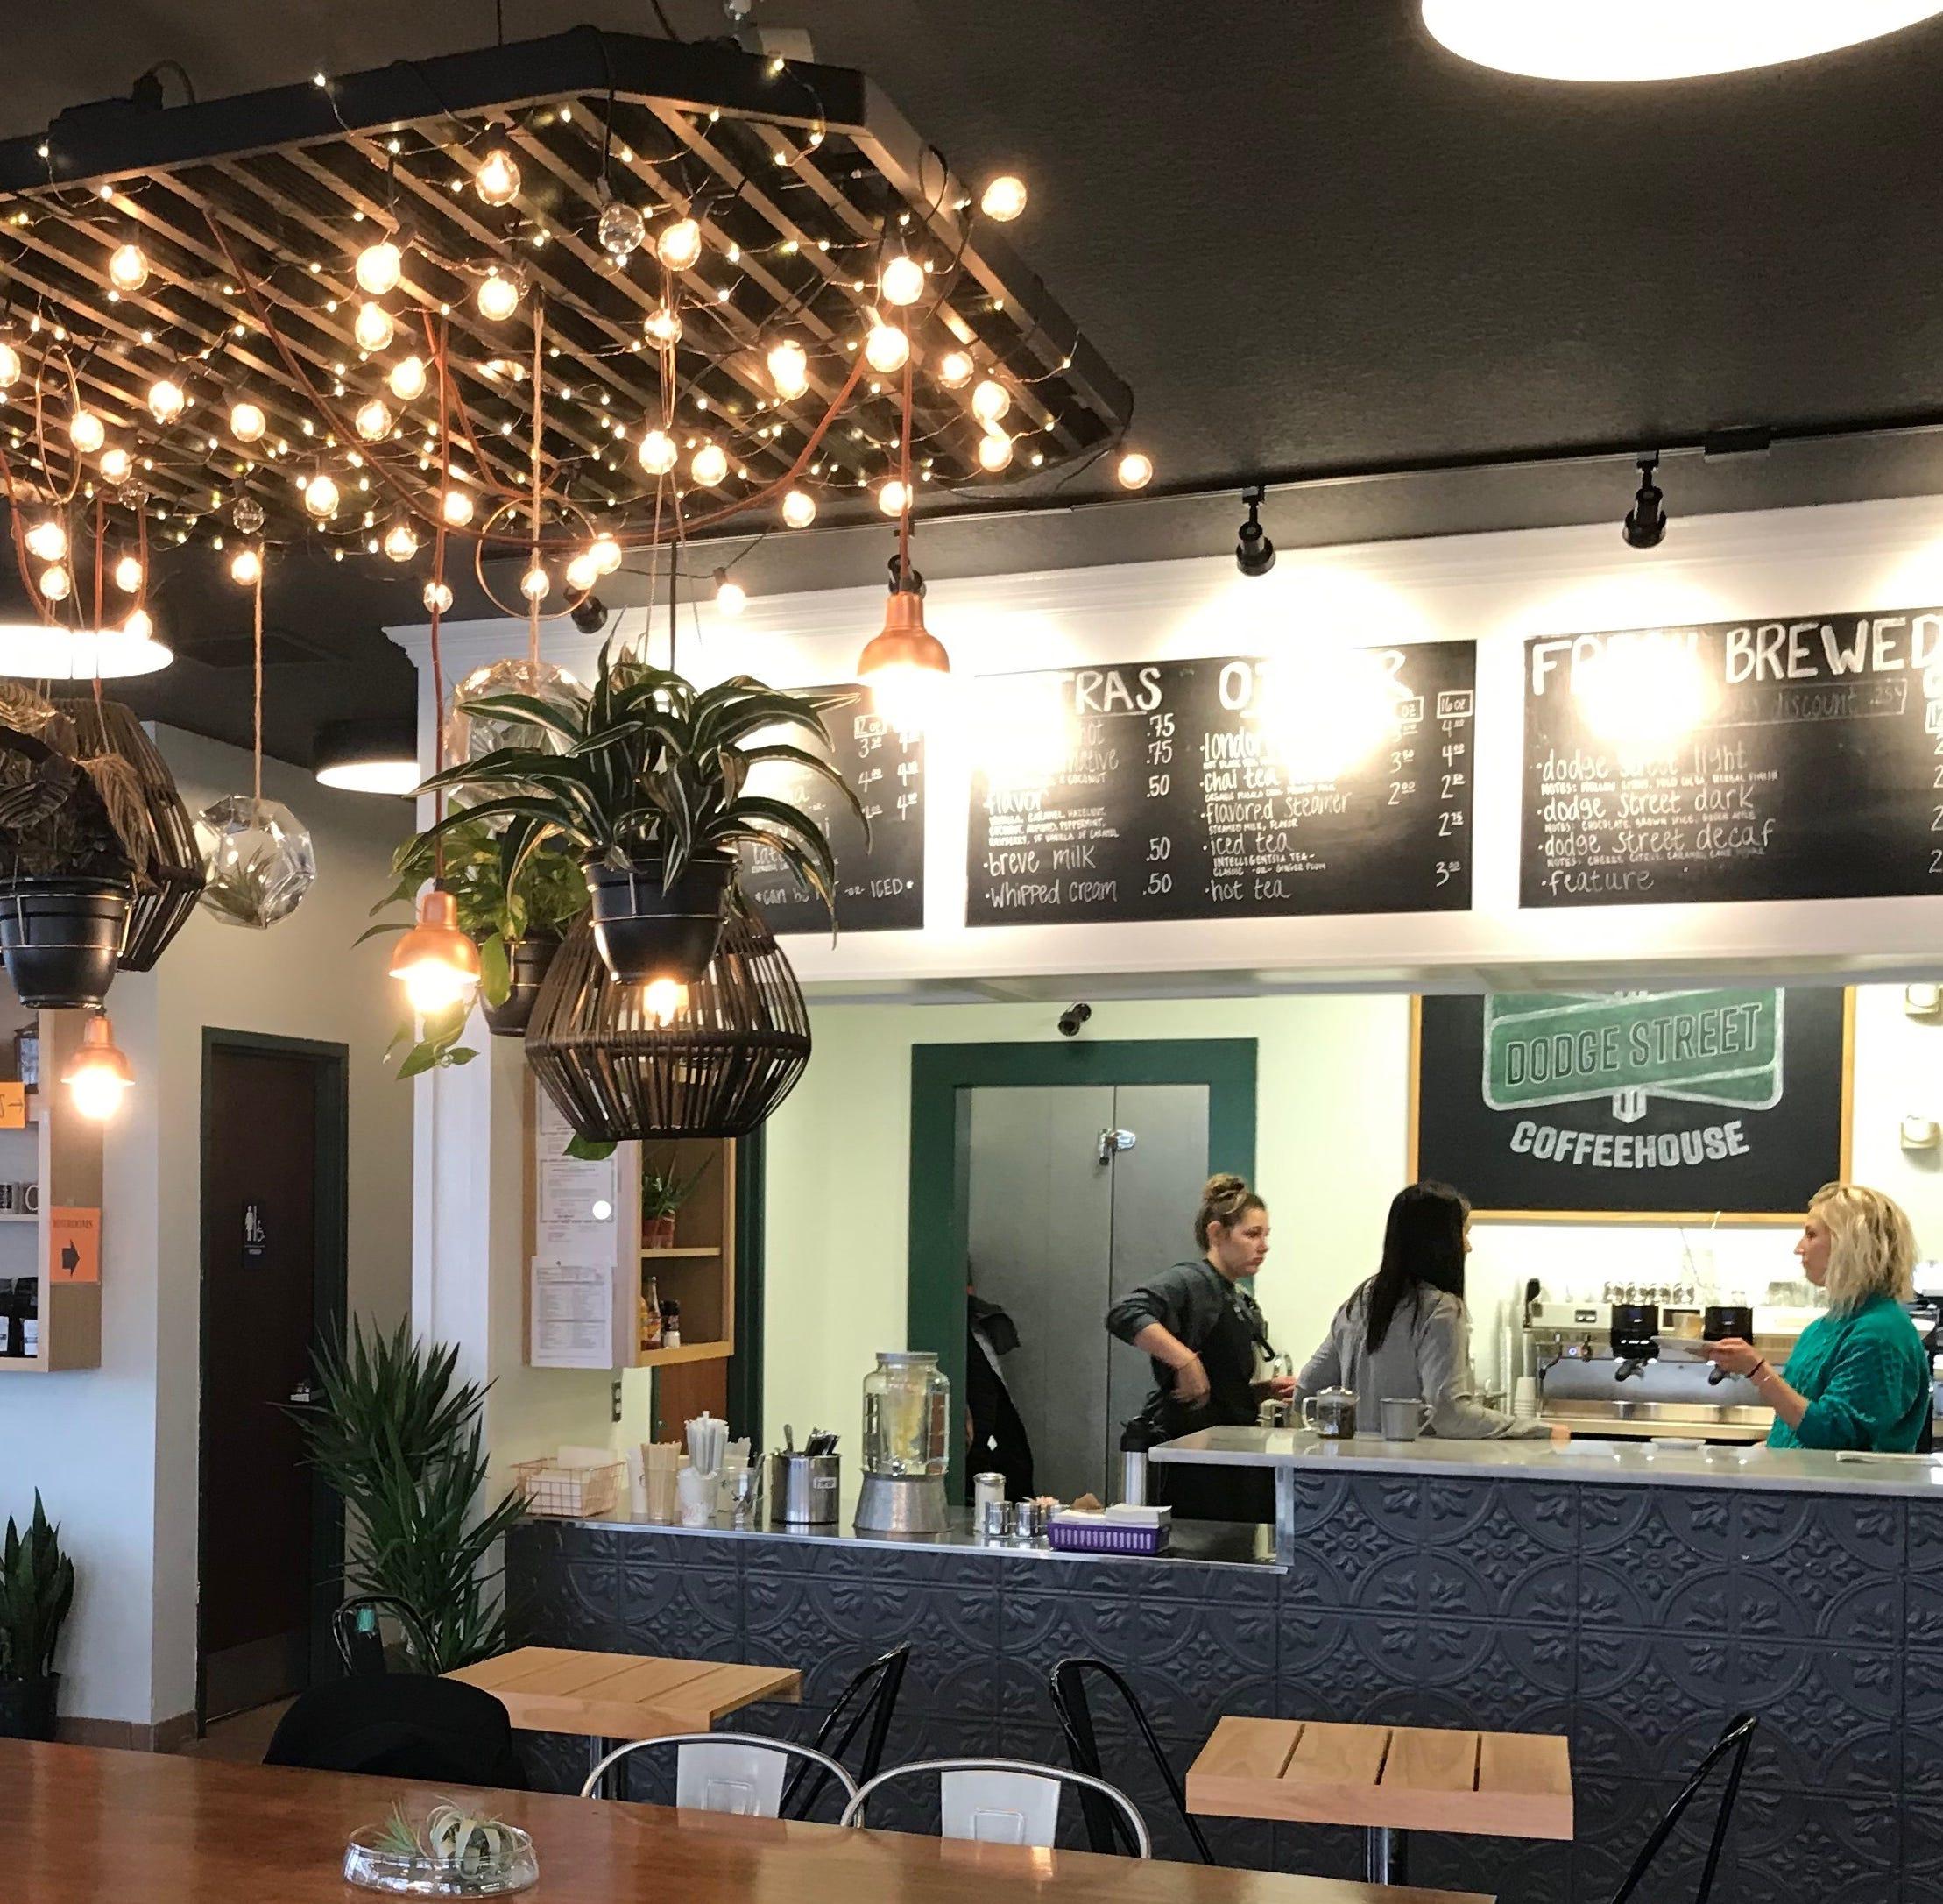 Northeast Iowa City gets its own coffee shop: Dodge Street Coffeehouse